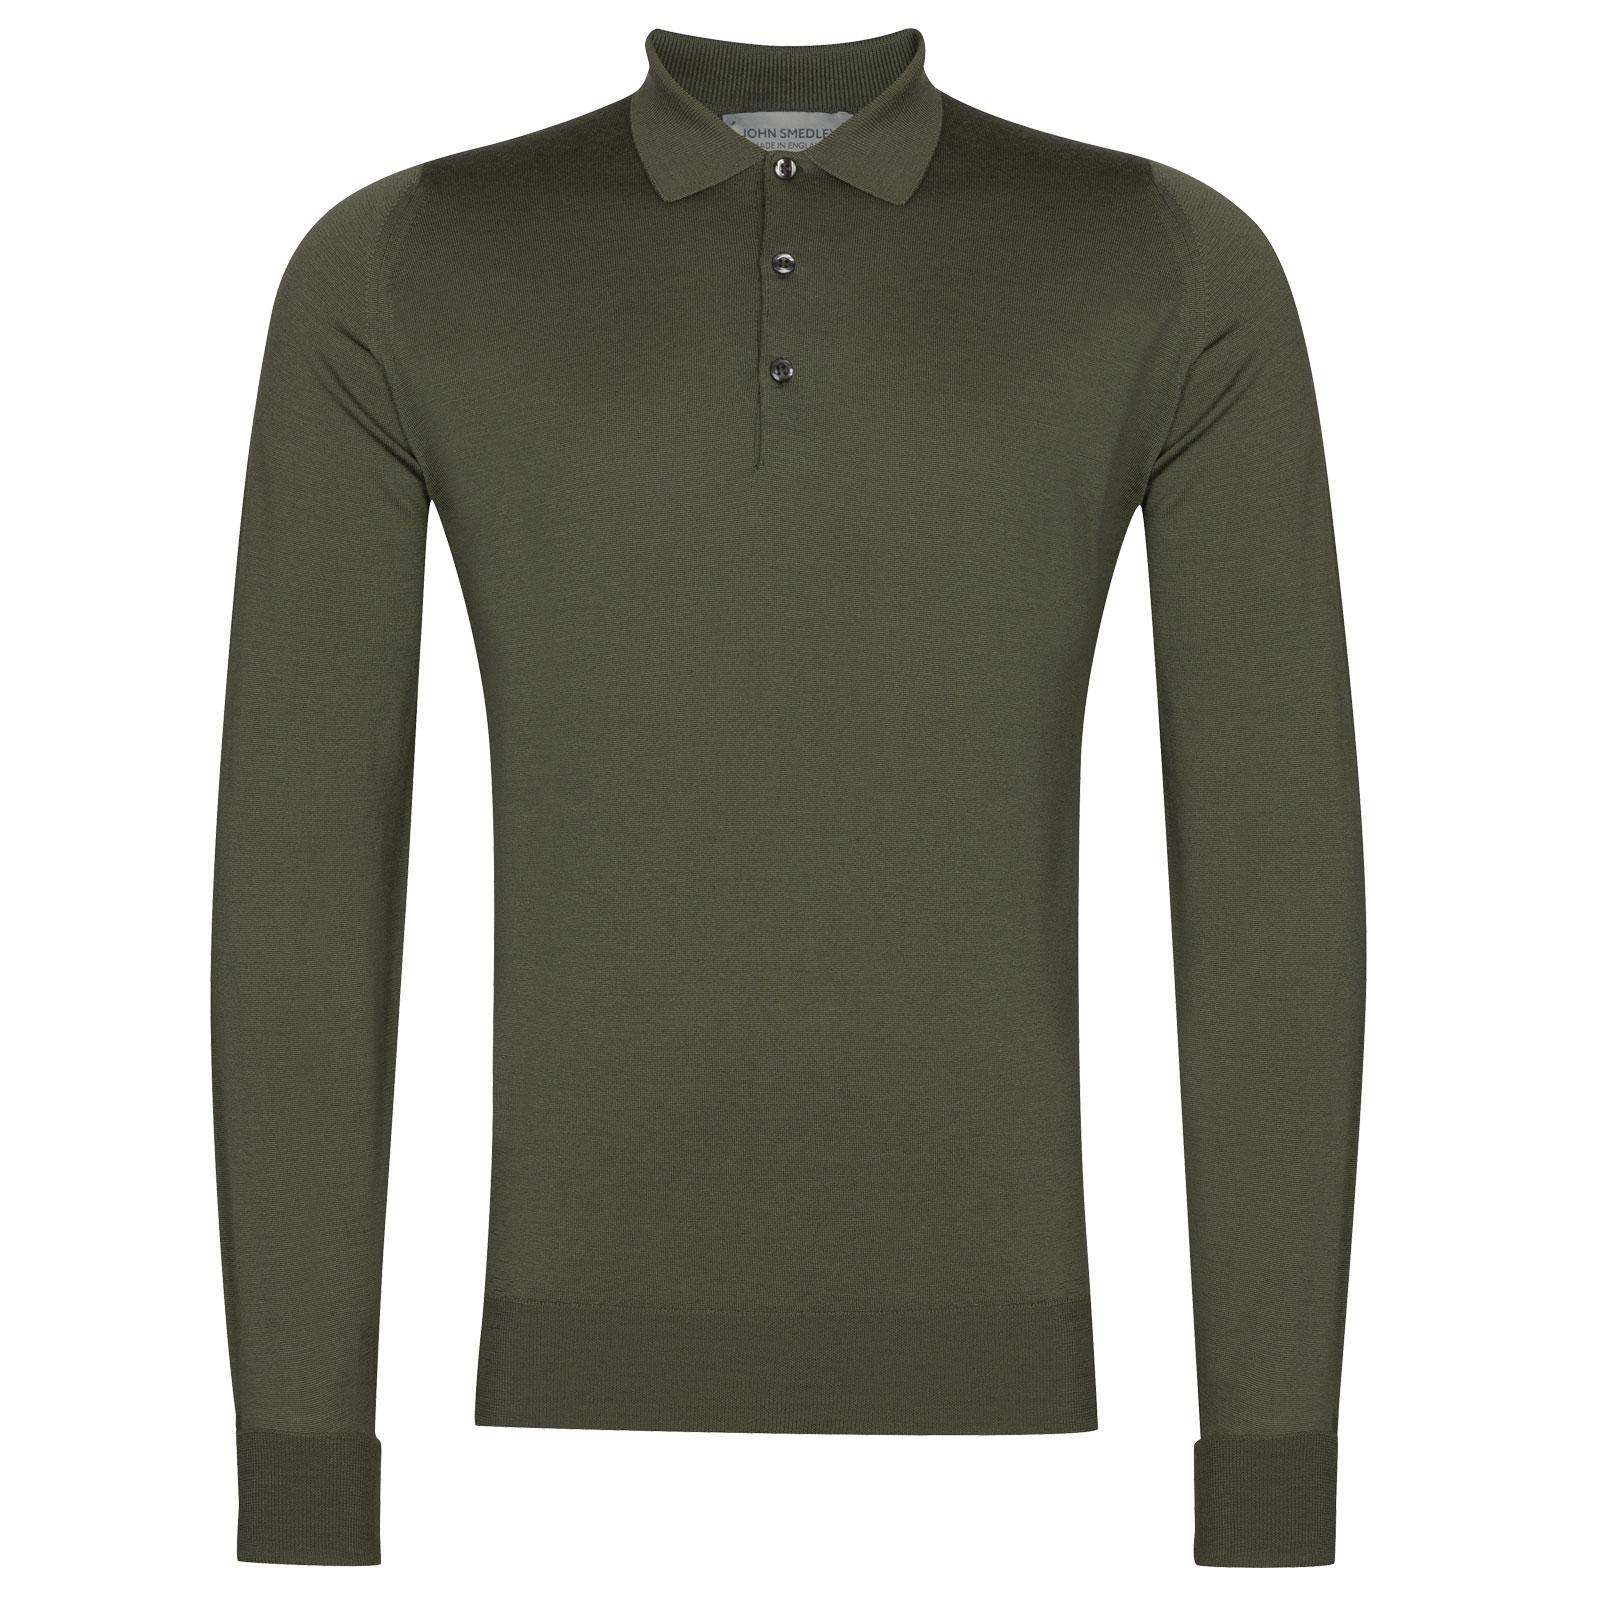 John Smedley Cotswold in Sepal Green Shirt-LGE